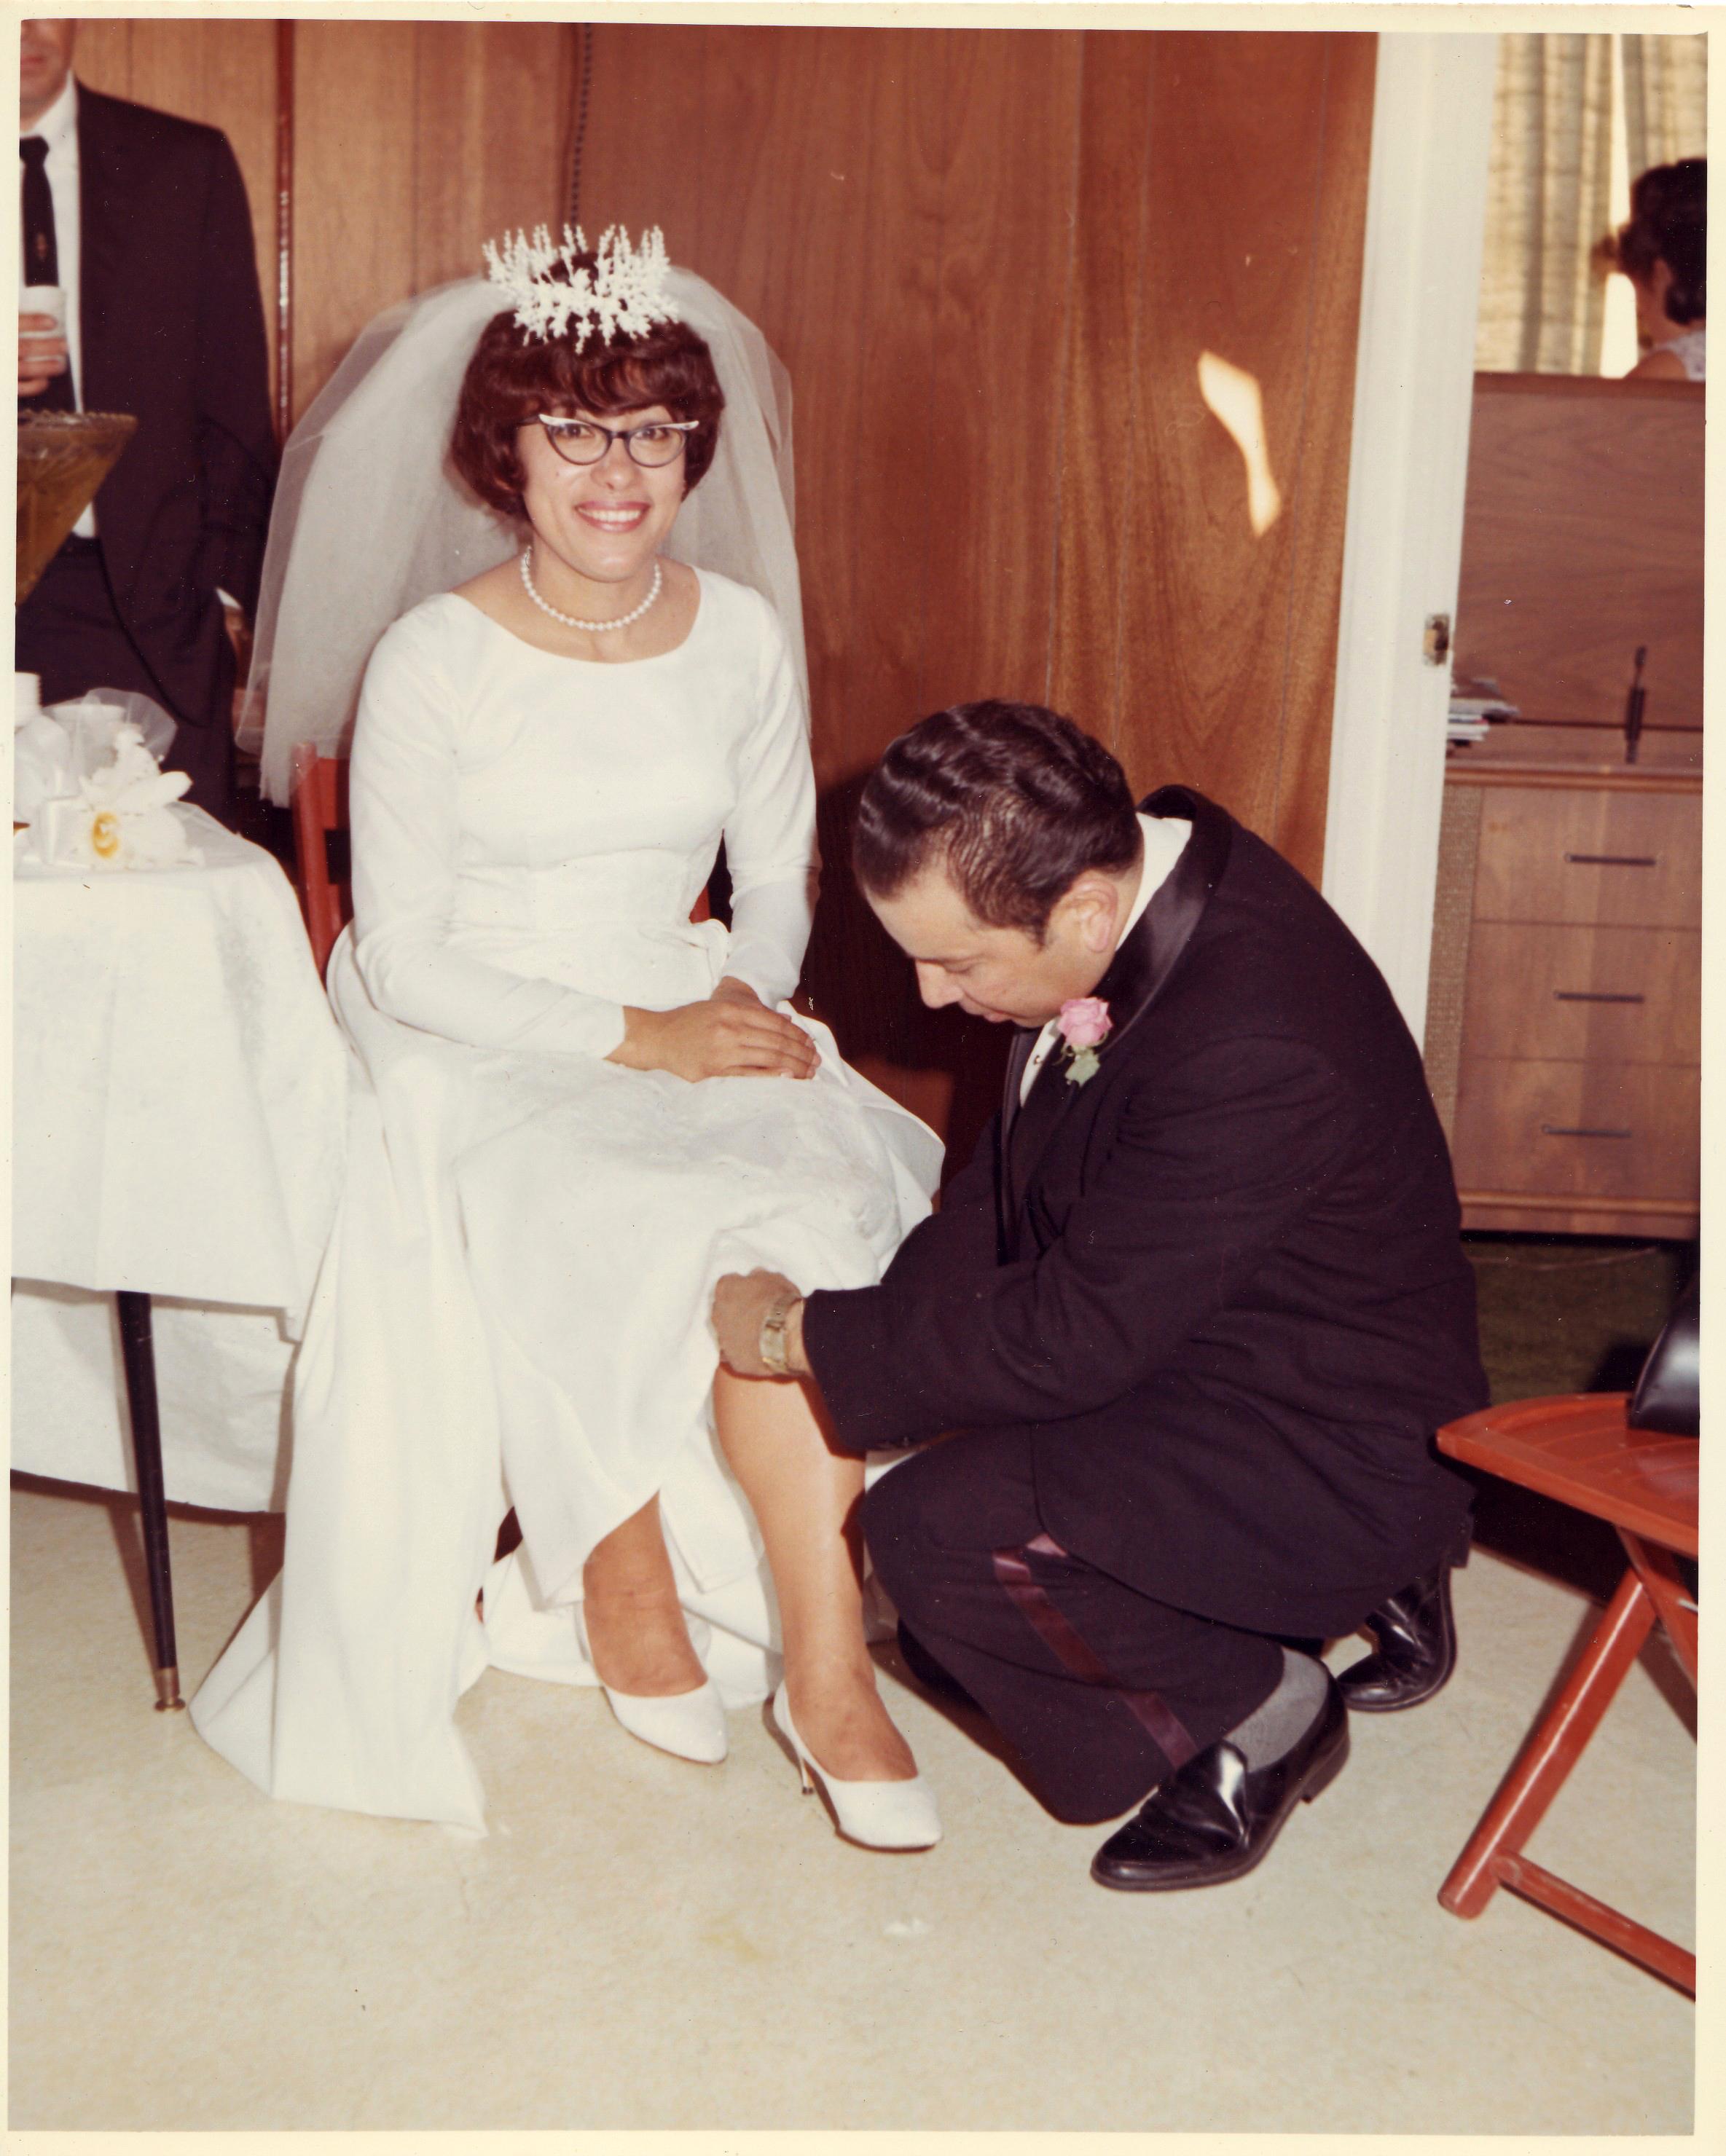 1966-RC-Getting the Garter, Raul and Elsa's wedding.jpg